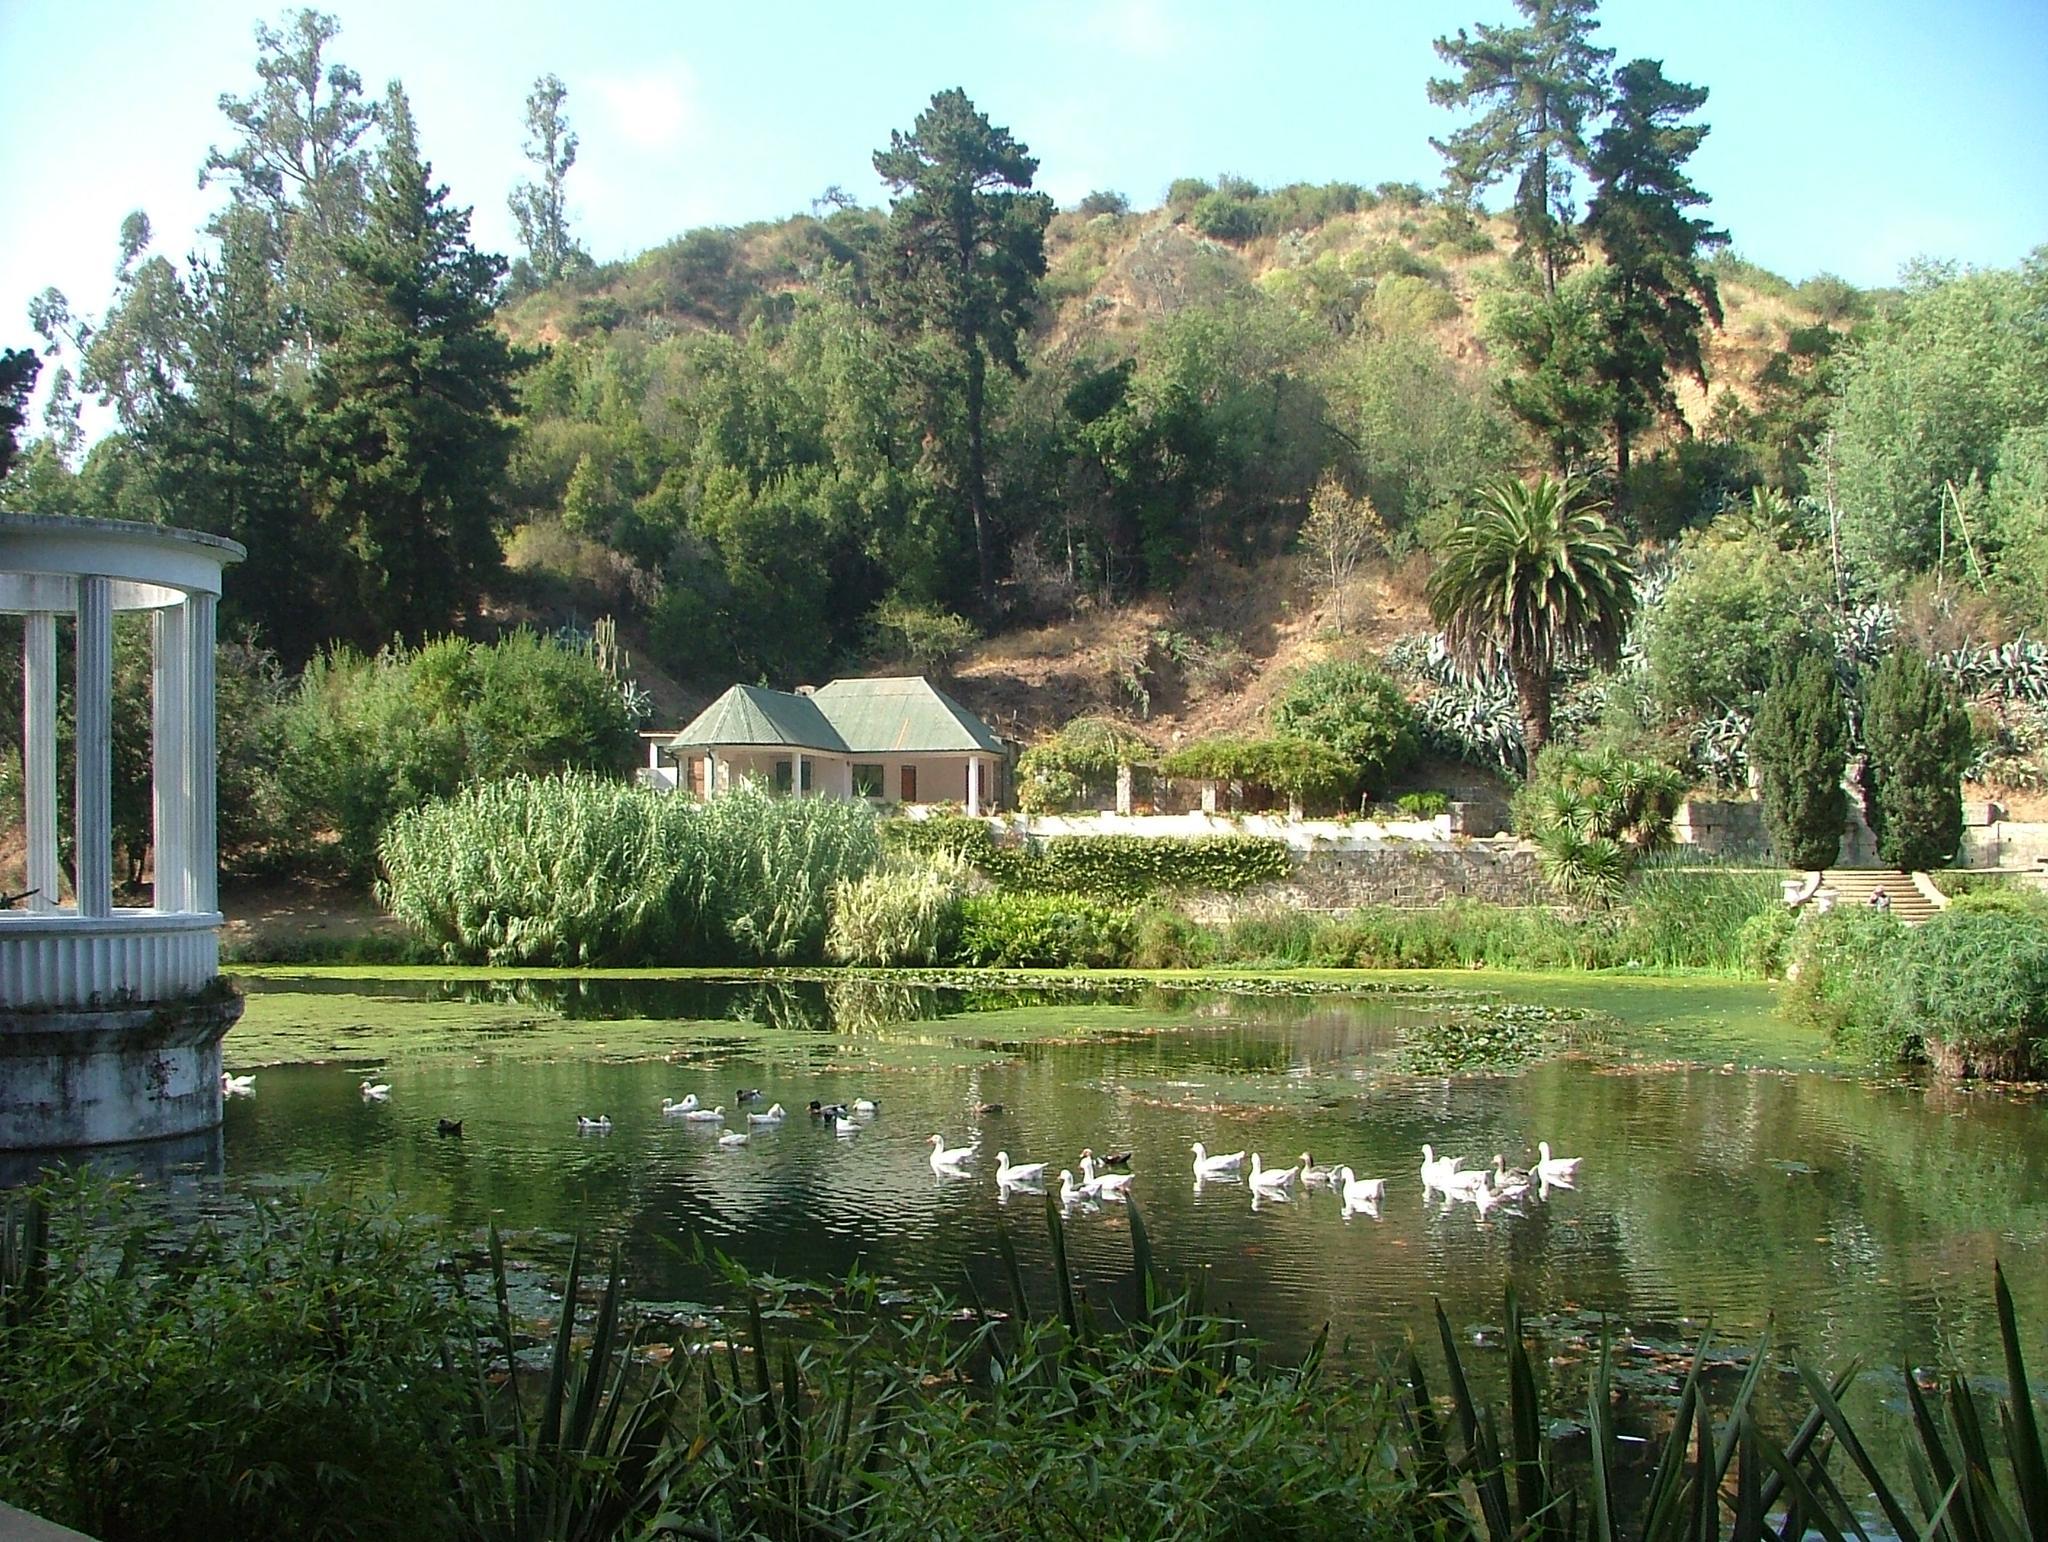 Parque Botanico Vina del Mar Chile by Tor Johansen